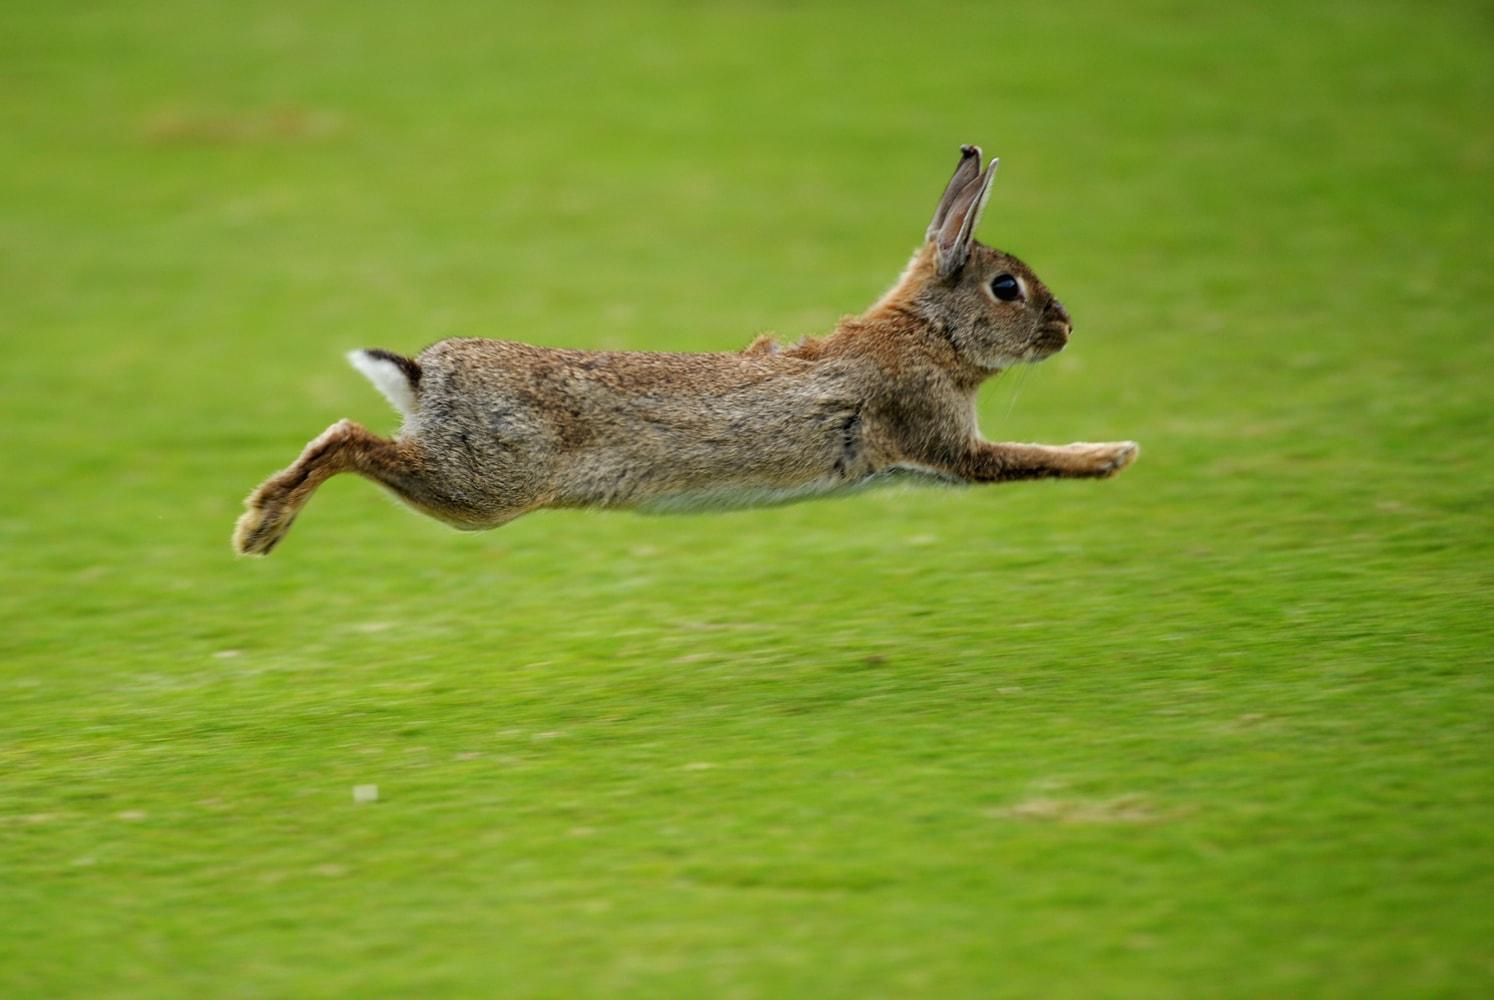 how the rabbit got its cotton white tail nbc news